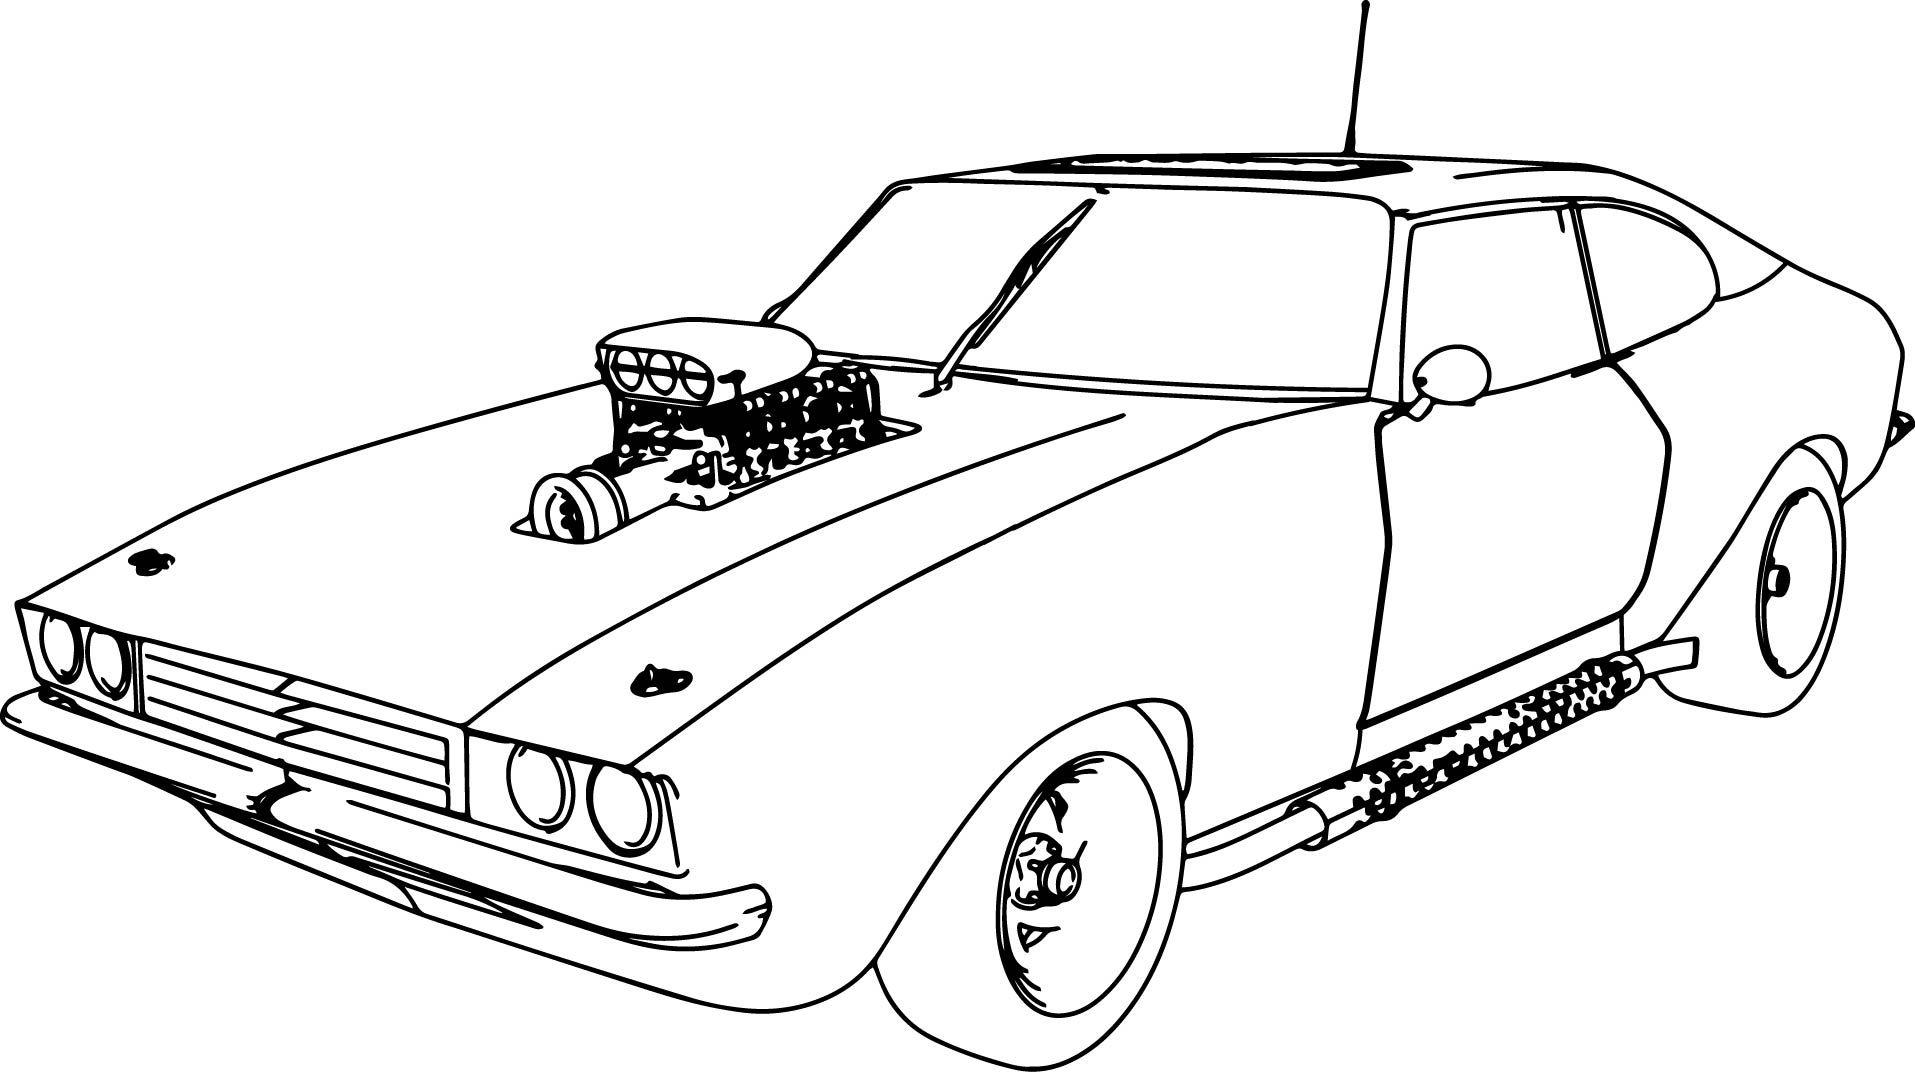 Exclusive Photo Of Muscle Car Coloring Pages Entitlementtrap Com Race Car Coloring Pages Cars Coloring Pages Sports Coloring Pages